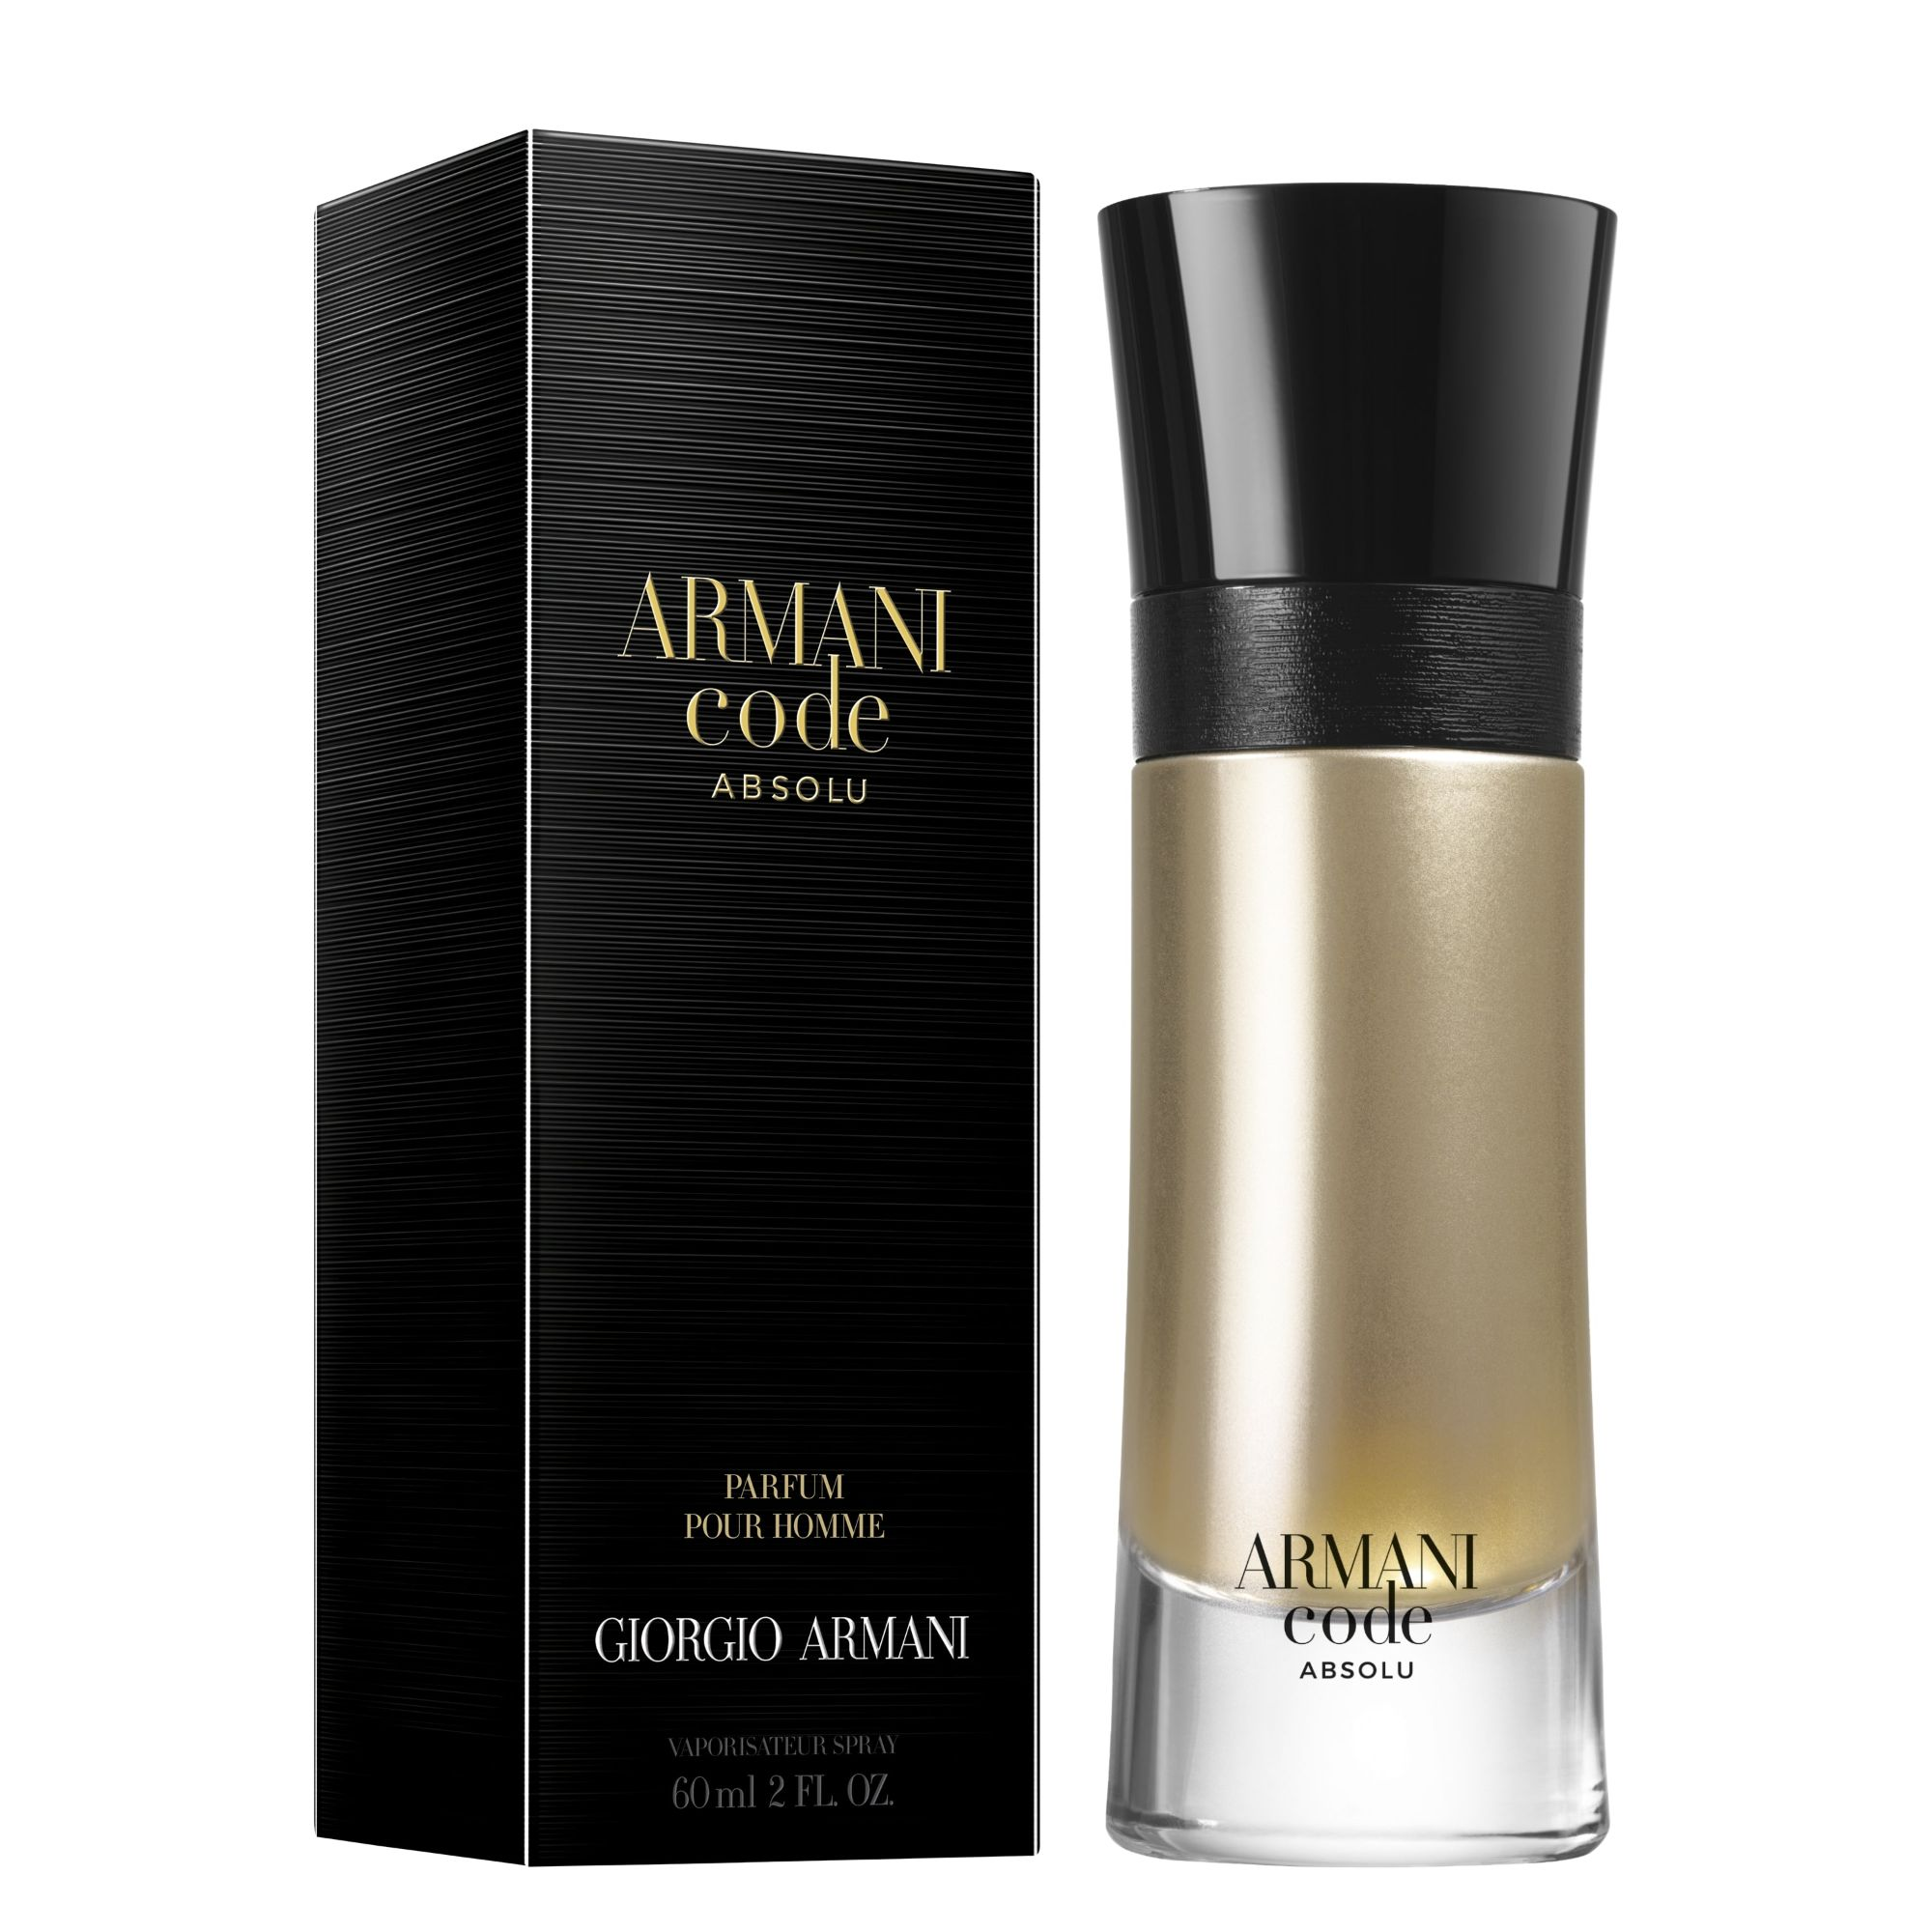 Giorgio Armani Armani Code Absolu EDP, 60 ml